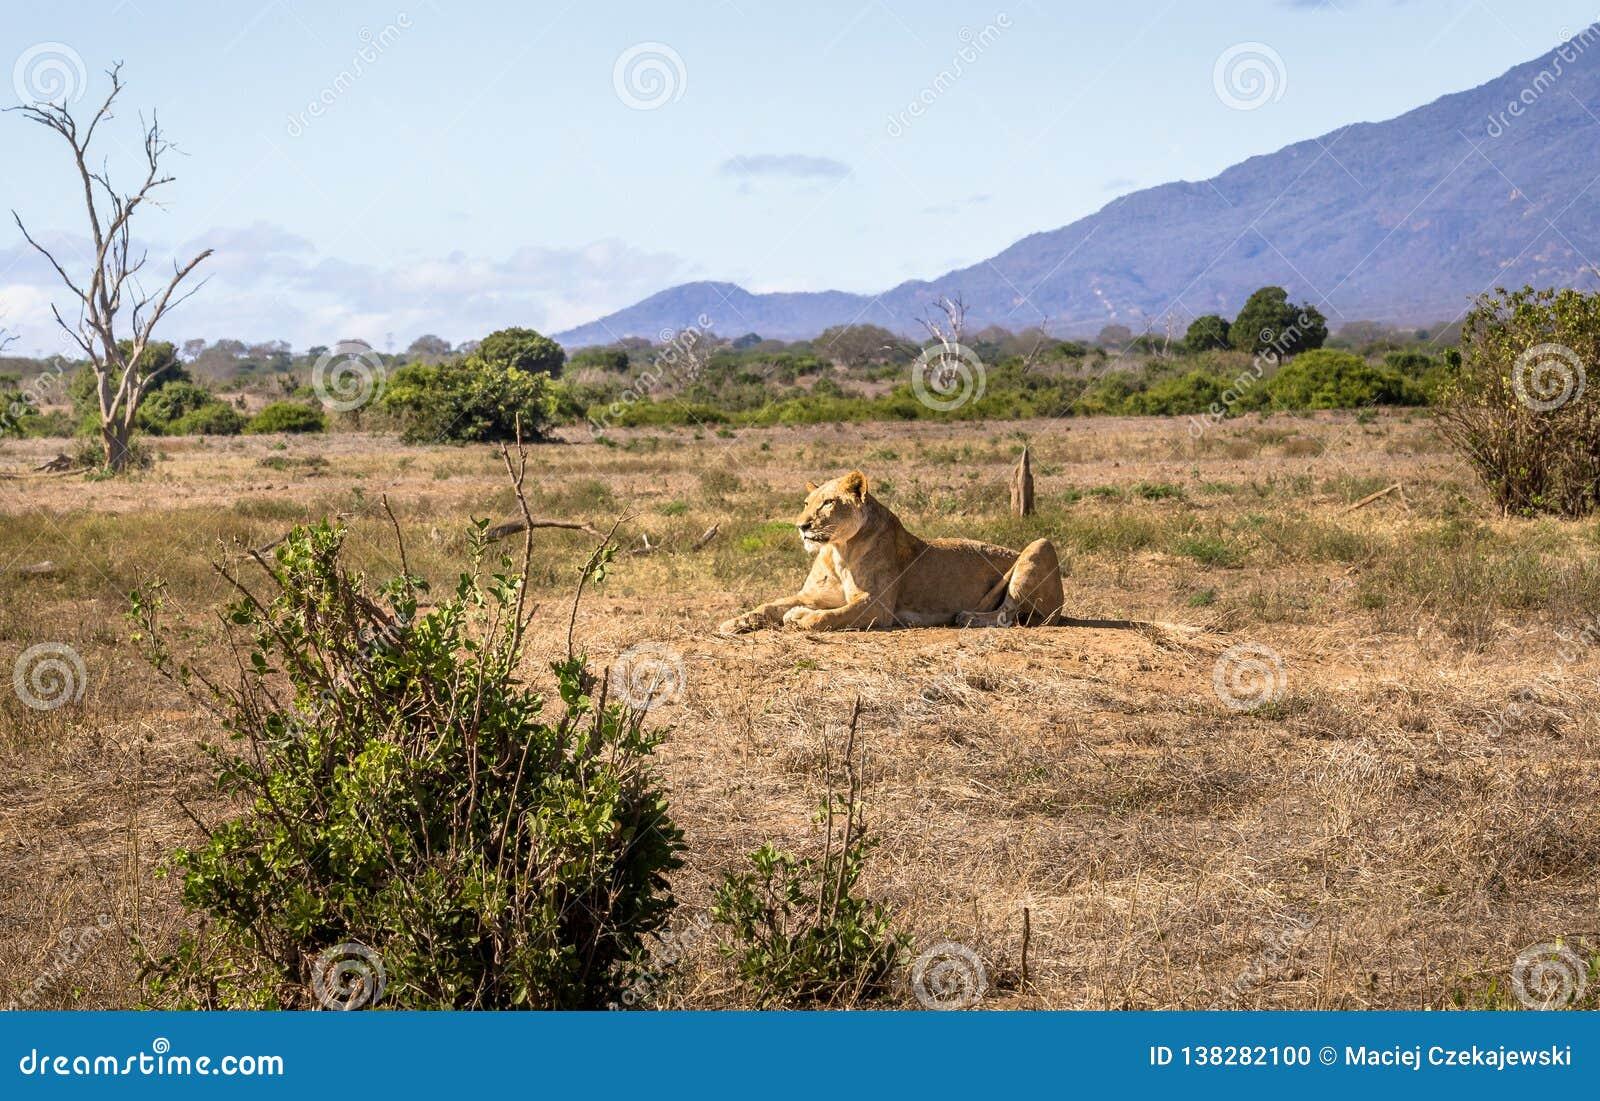 African lioness in Kenya